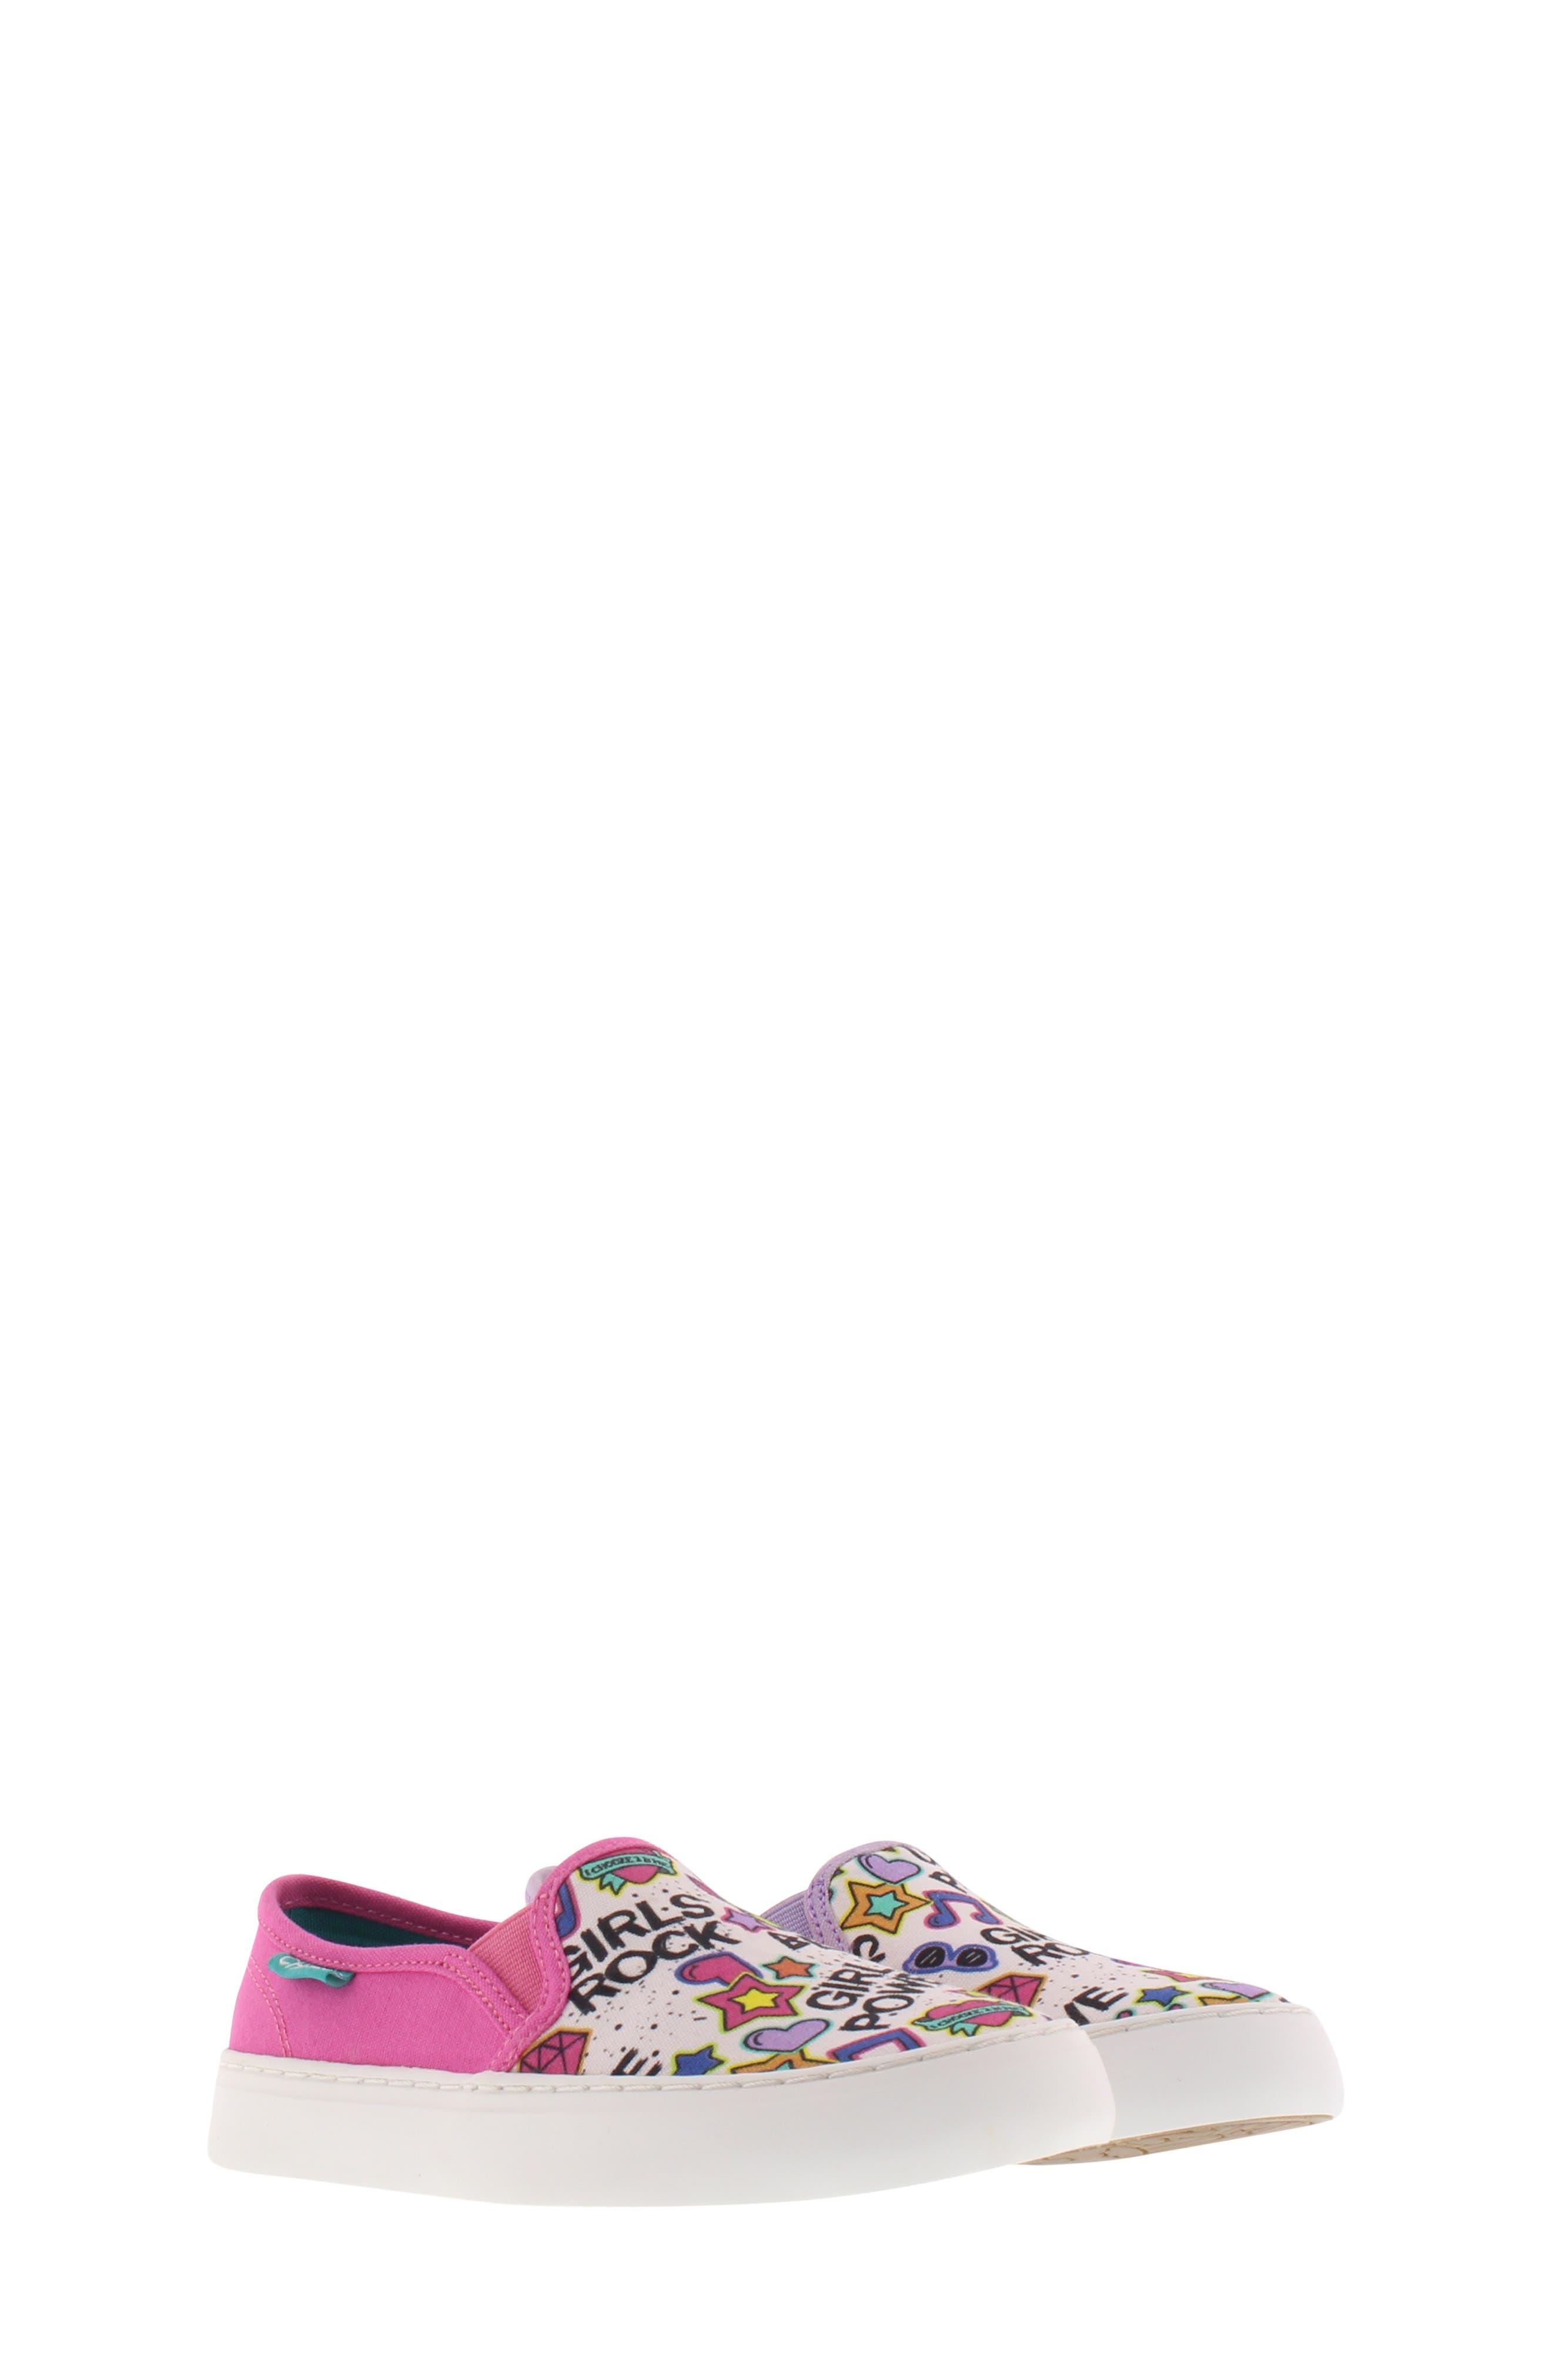 CHOOZE Move Motion Slip-On Sneaker, Main, color, PINK LAVENDER